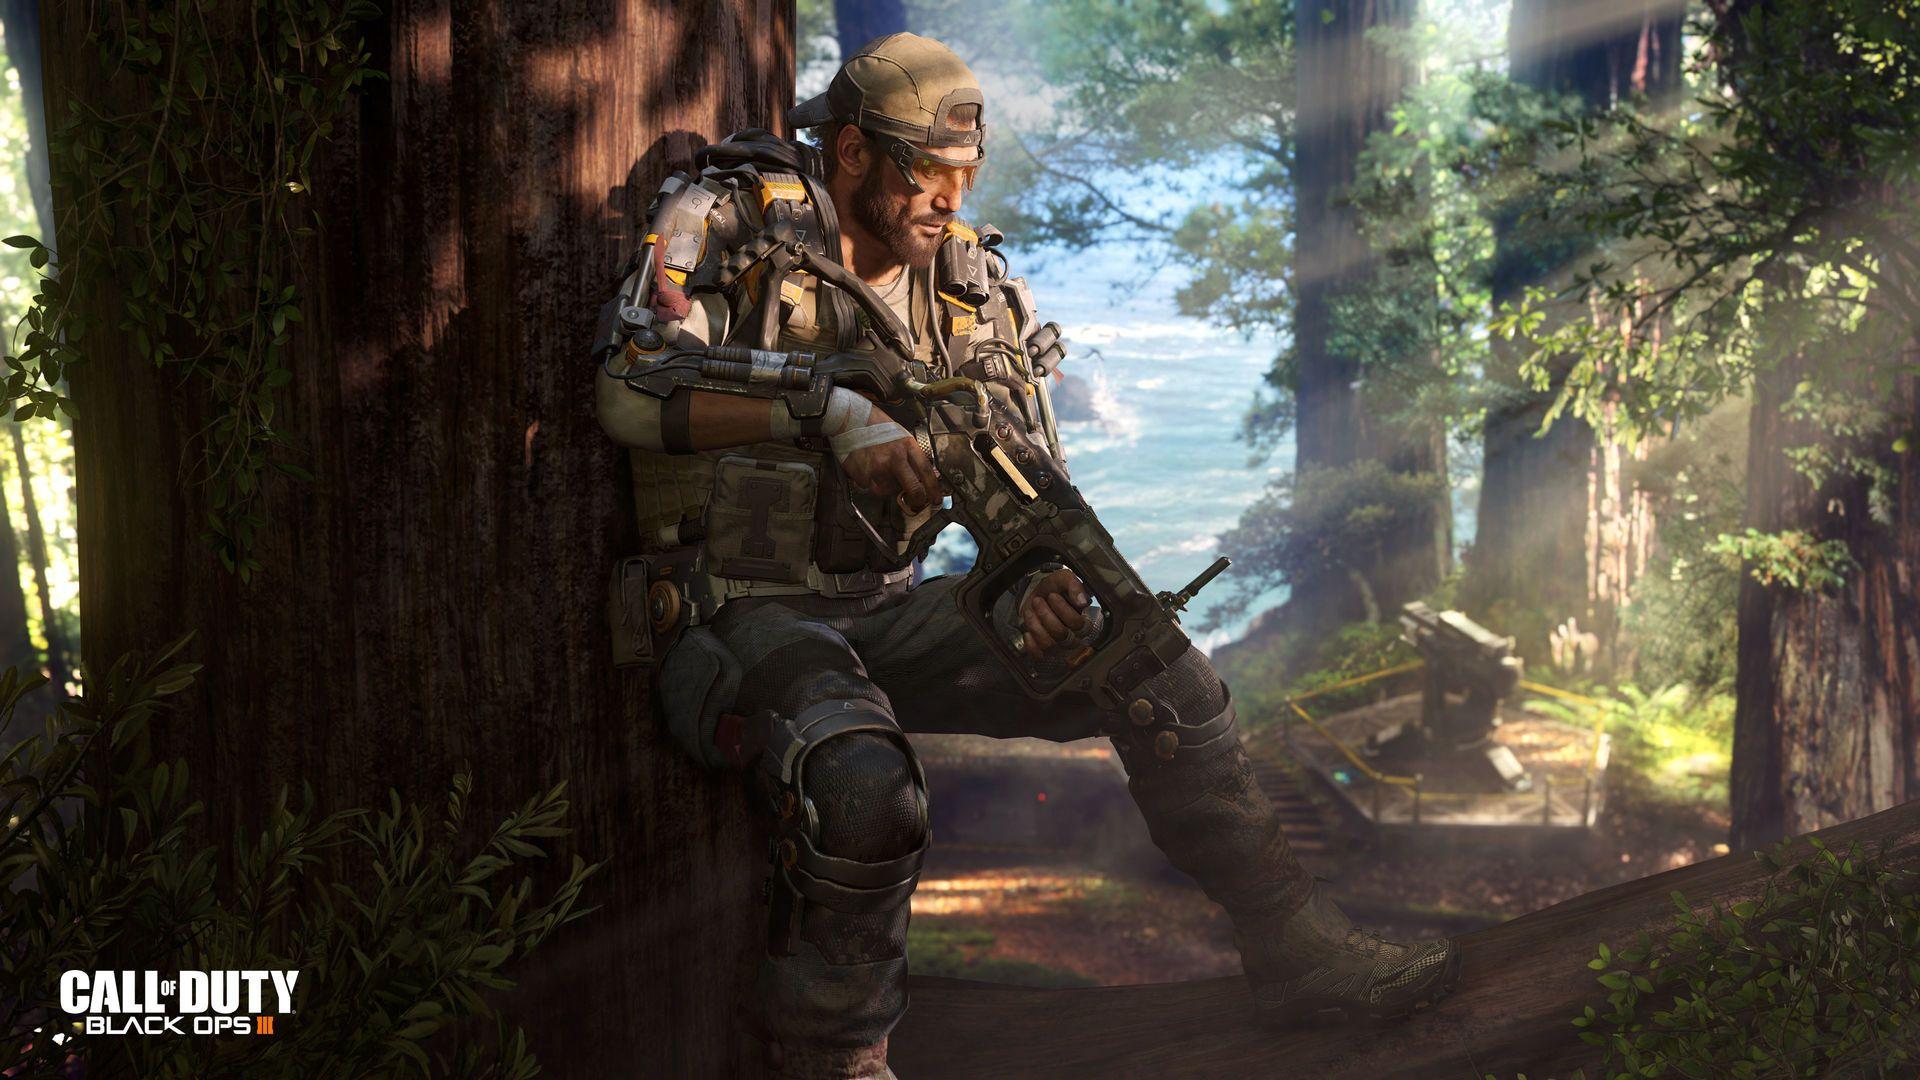 Call Of Duty Black Ops 3 Blackops3 Blackops Callofduty Games Videogames Shooter Callofdutyblackops3 Blac Videojuegos Call Of Duty Fondos De Pantallla